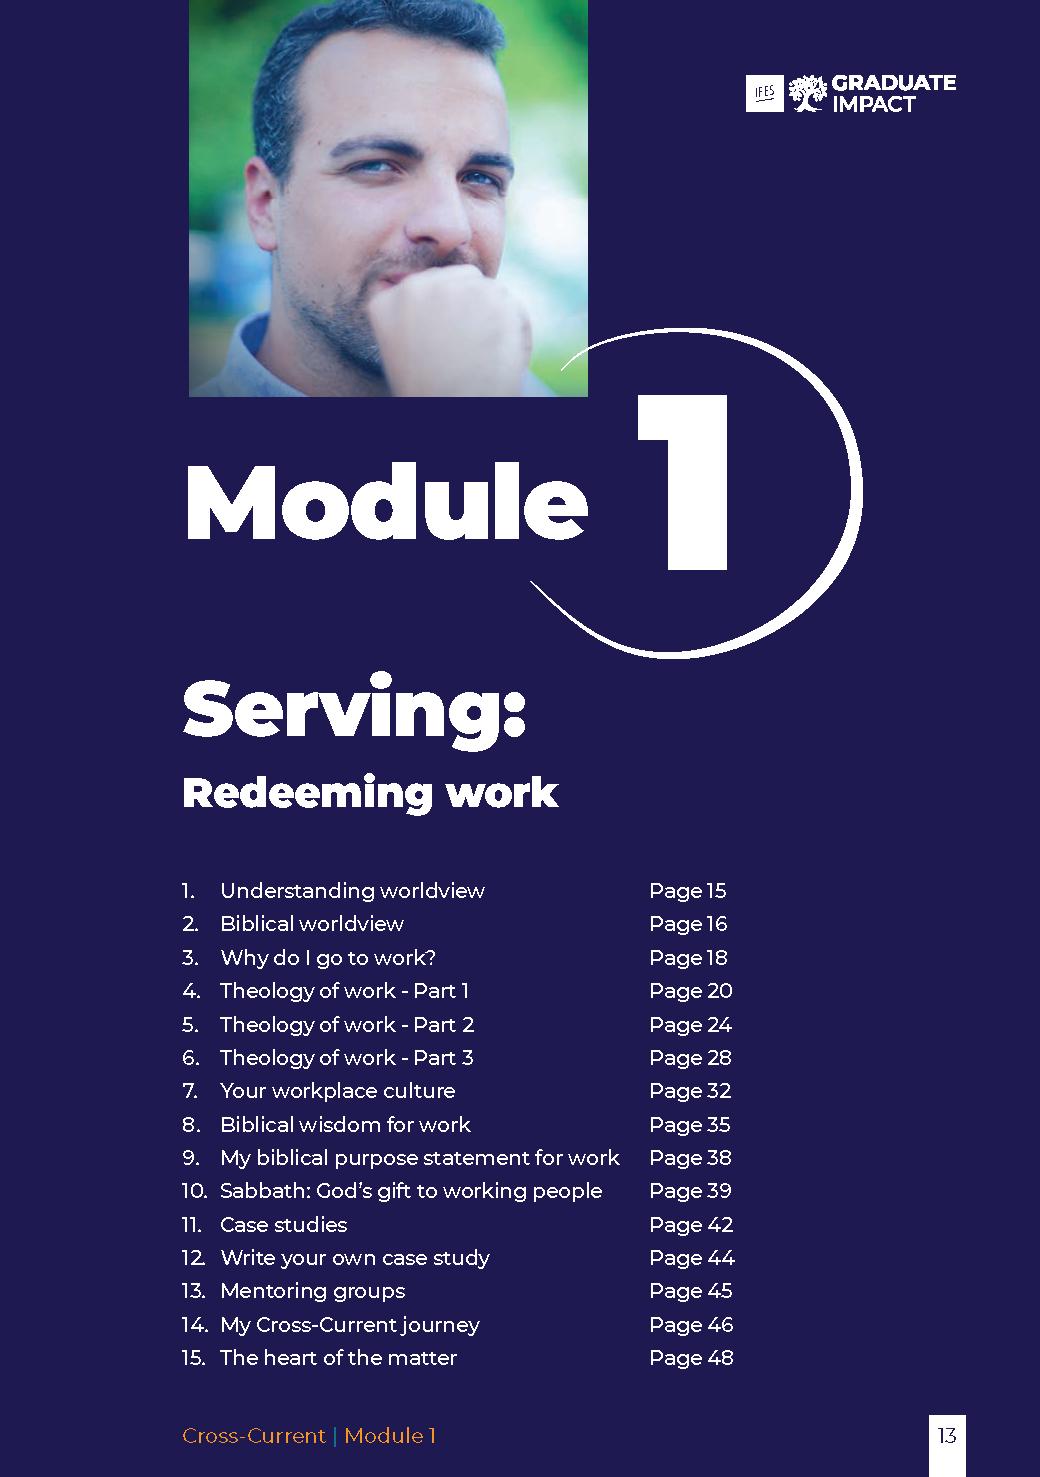 Graduate-Impact-Workbook-B5-Module-1-3 15.png